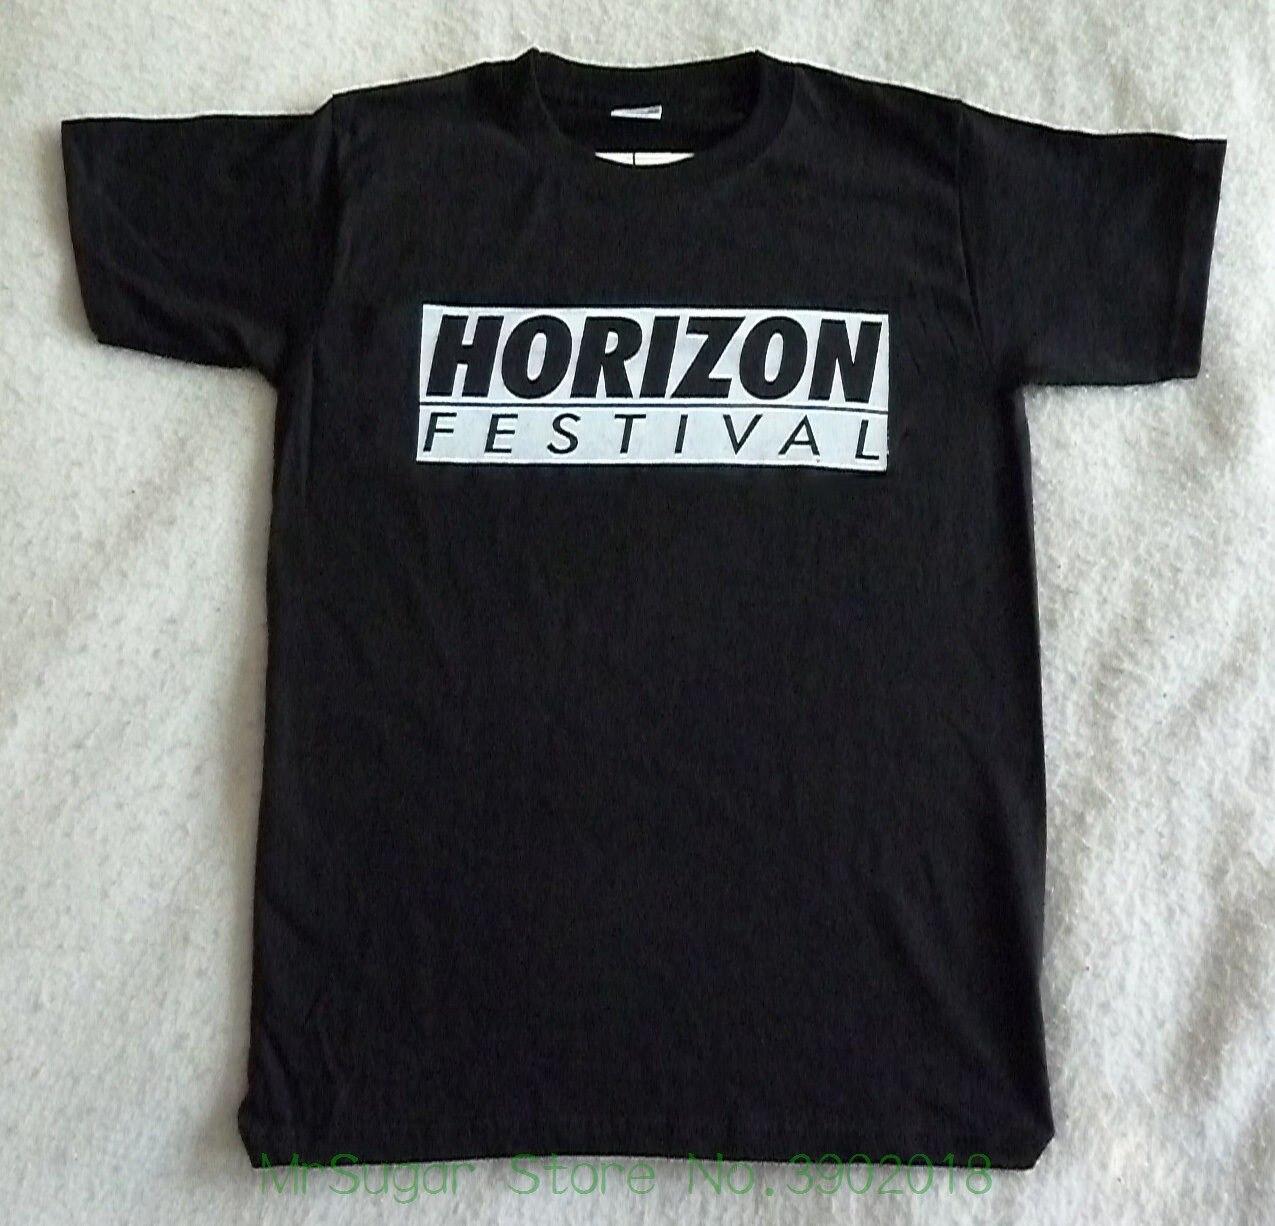 Forza Horizon Festival camiseta novedad Cool tapas hombres de manga corta Camiseta